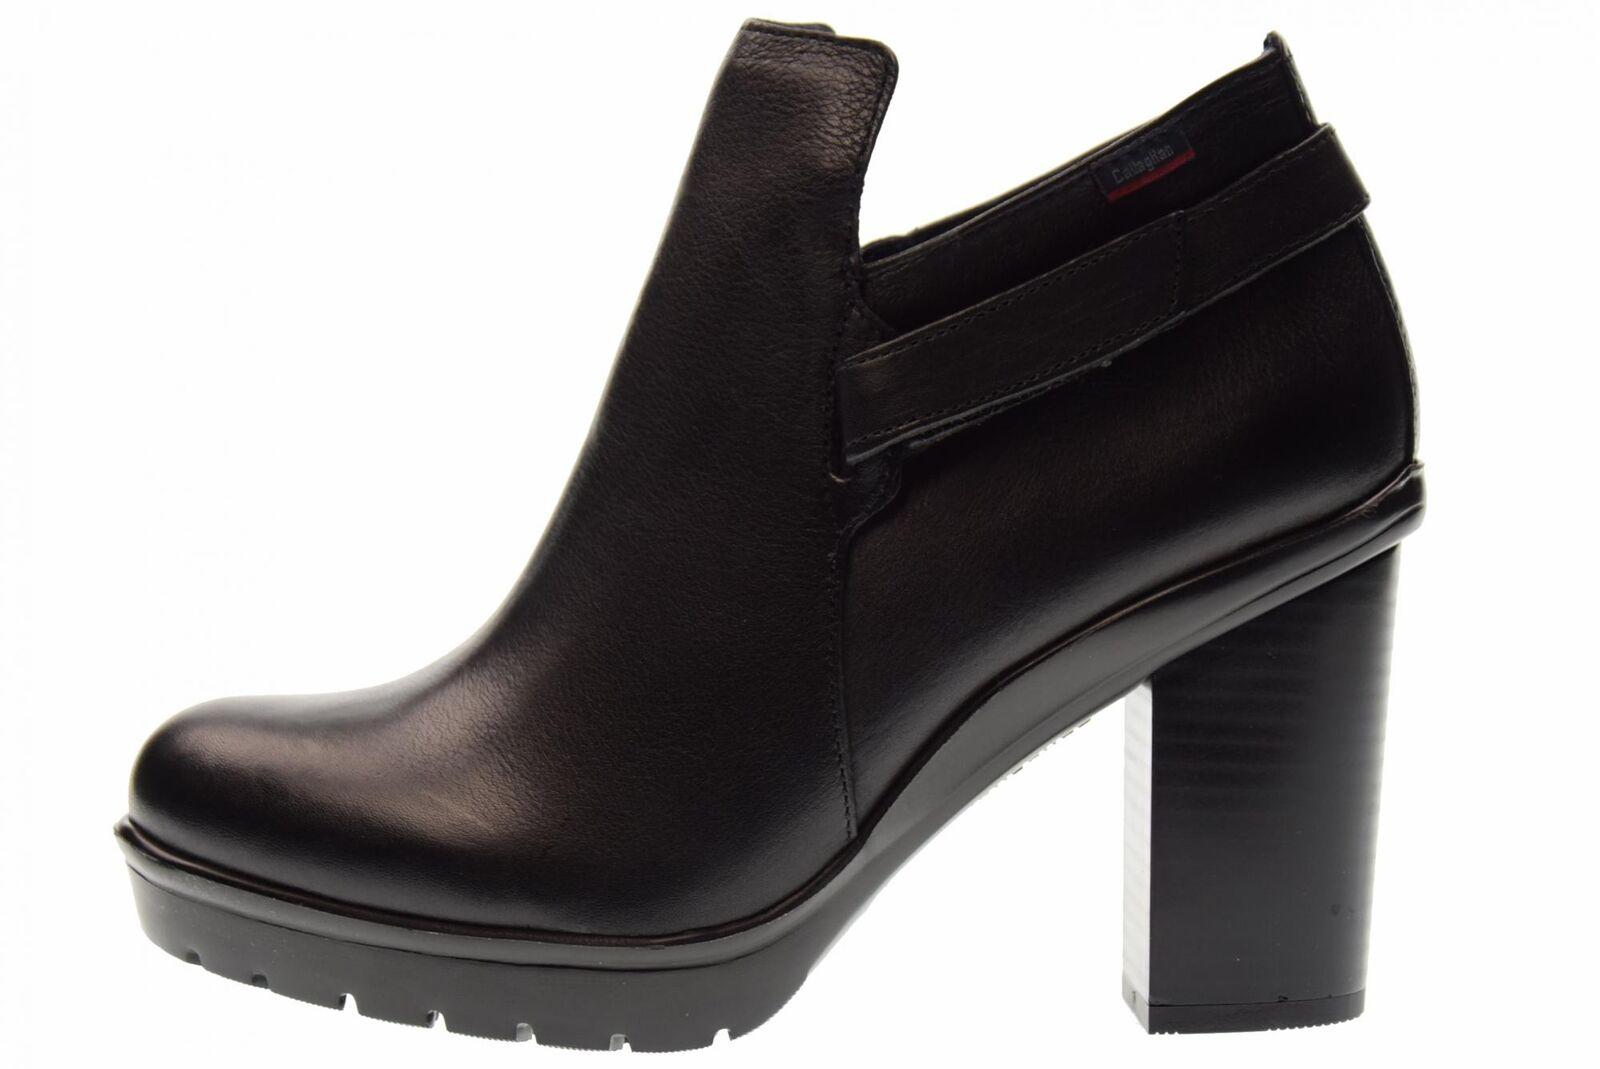 Callaghan A17g Schuhe Frau Stiefeletten 99812 BLACK BLACK BLACK fda867